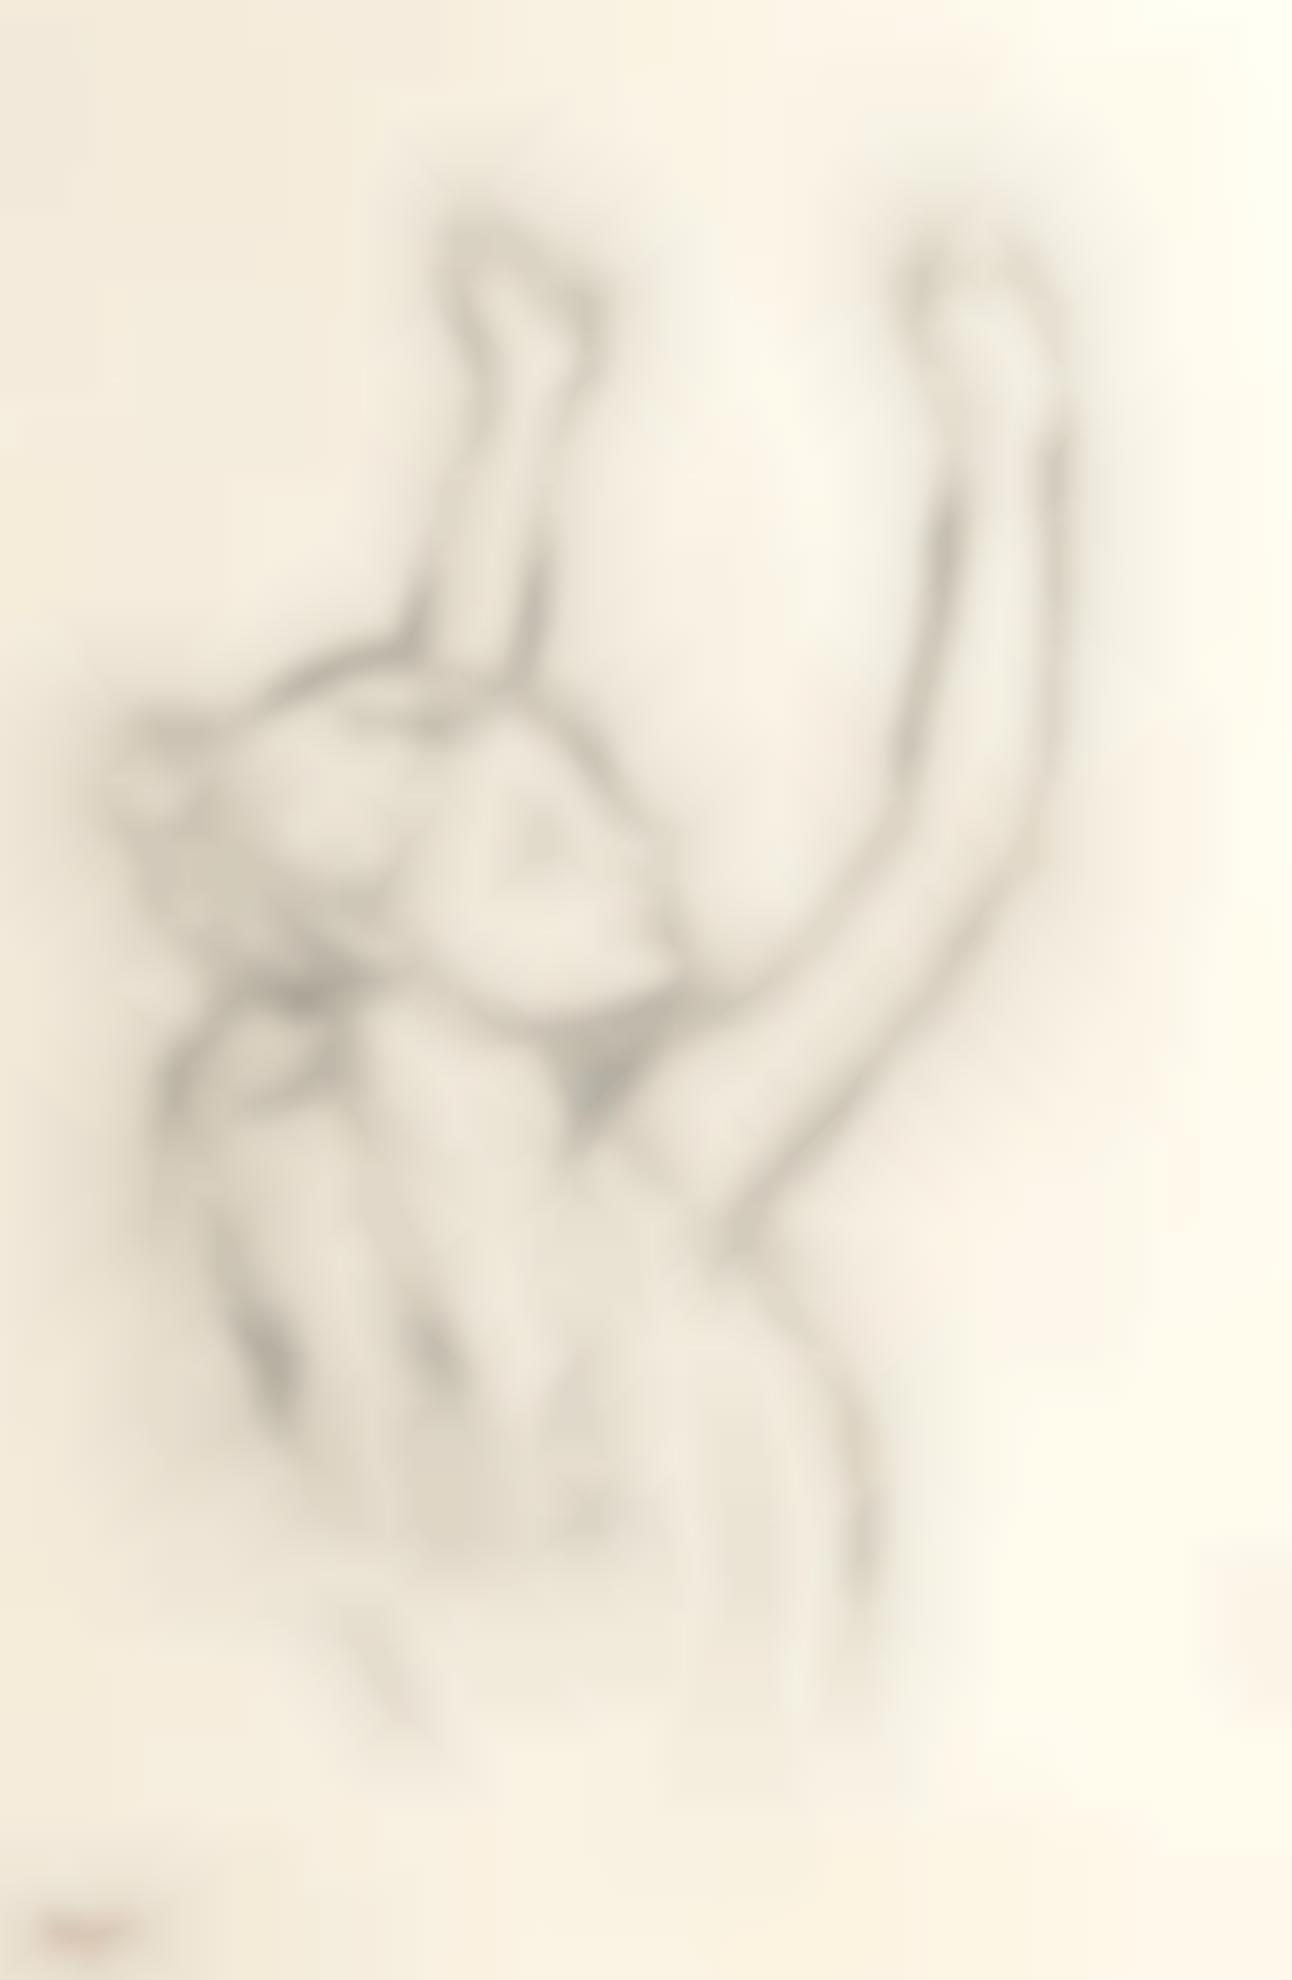 Edgar Degas-Danseuse, Les Bras Leves-